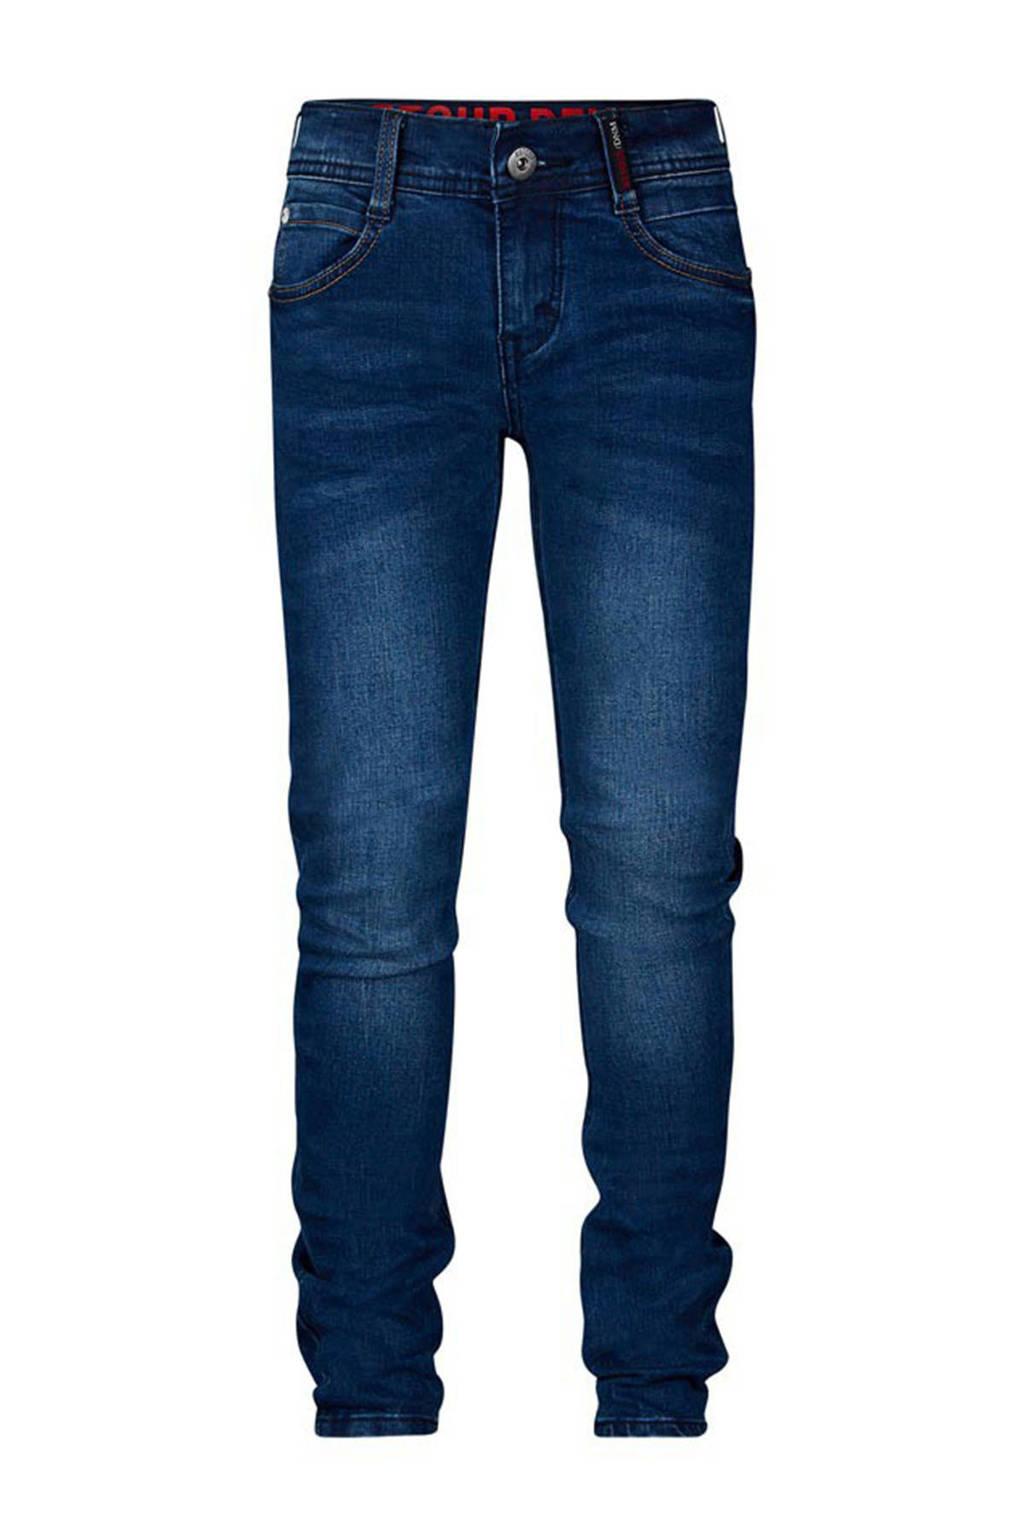 Retour Denim skinny fit jeans Bas medium blue denim, Medium blue denim